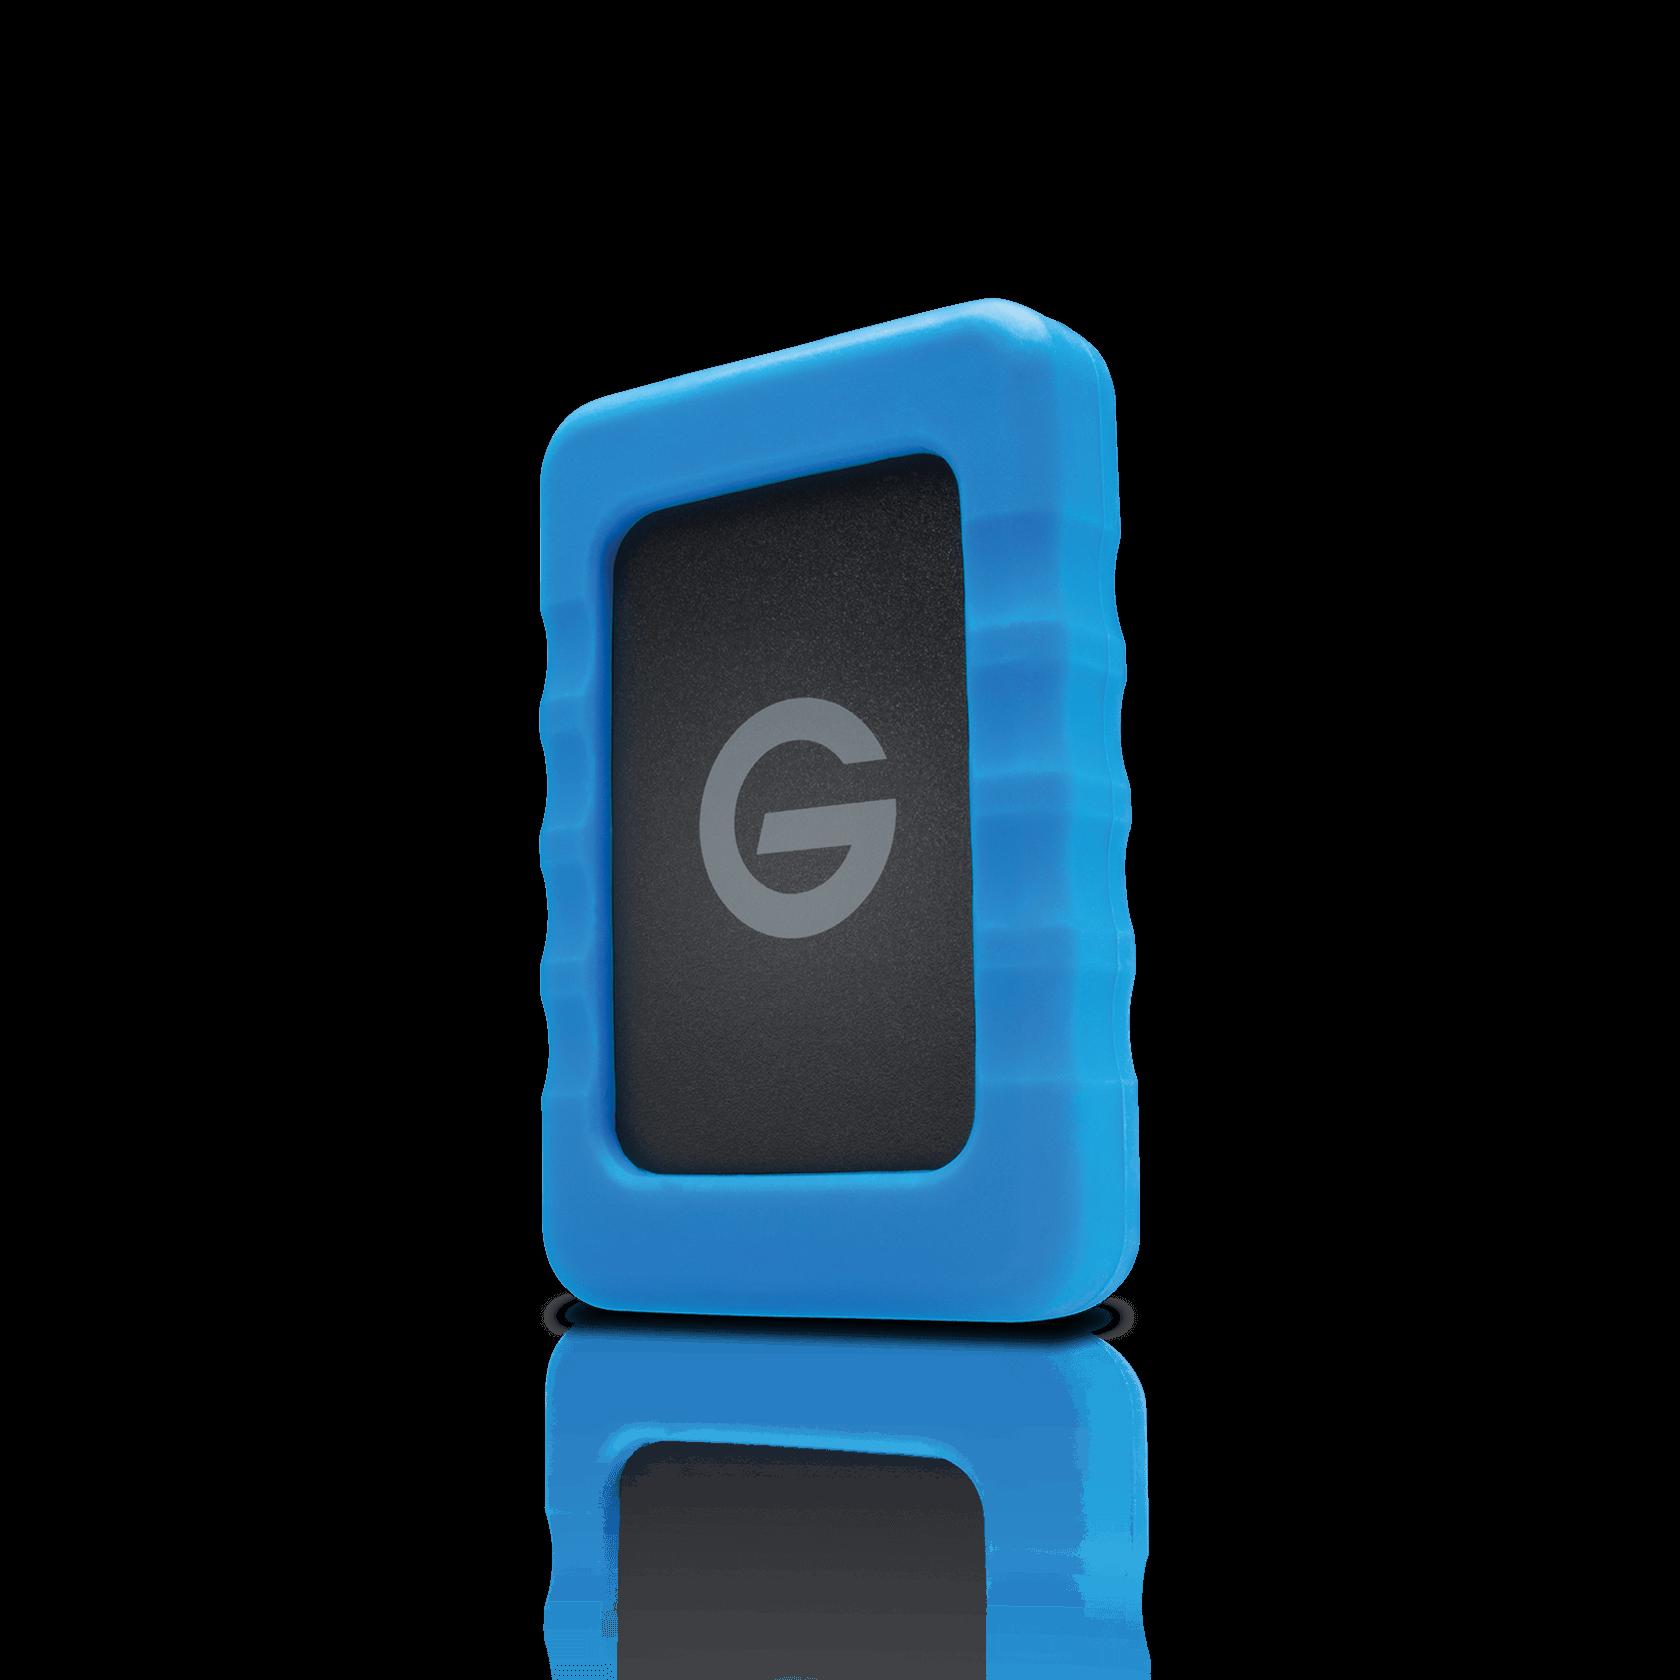 WesternDigital coupon: G-Technology 1TB G-DRIVE ev RaW - 0G04101-1